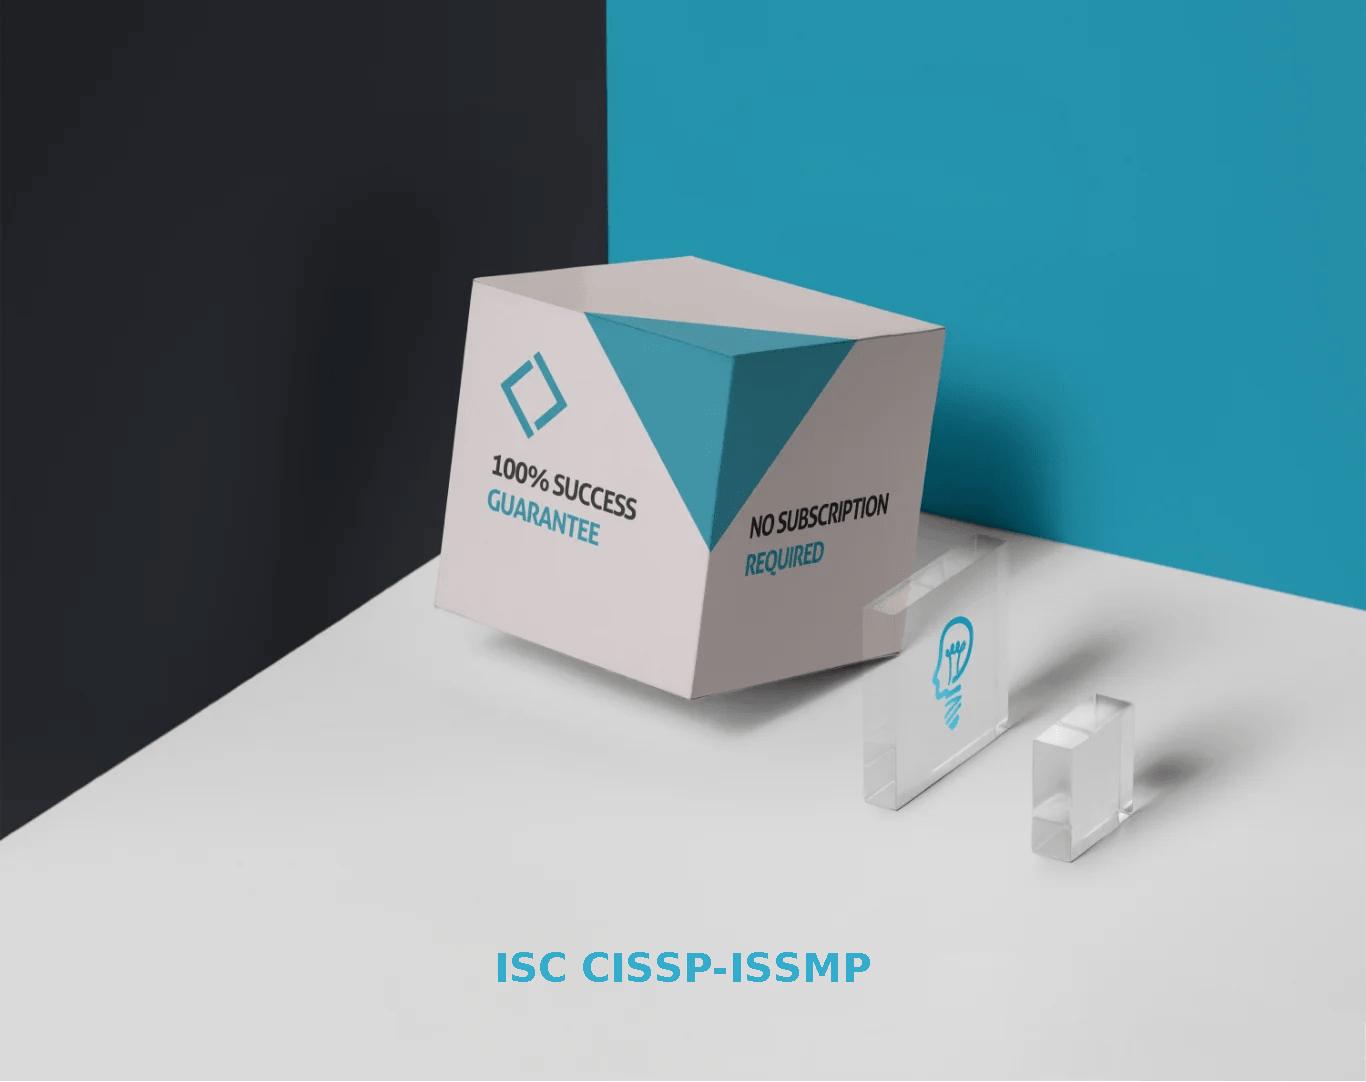 ISC CISSP-ISSMP Exams